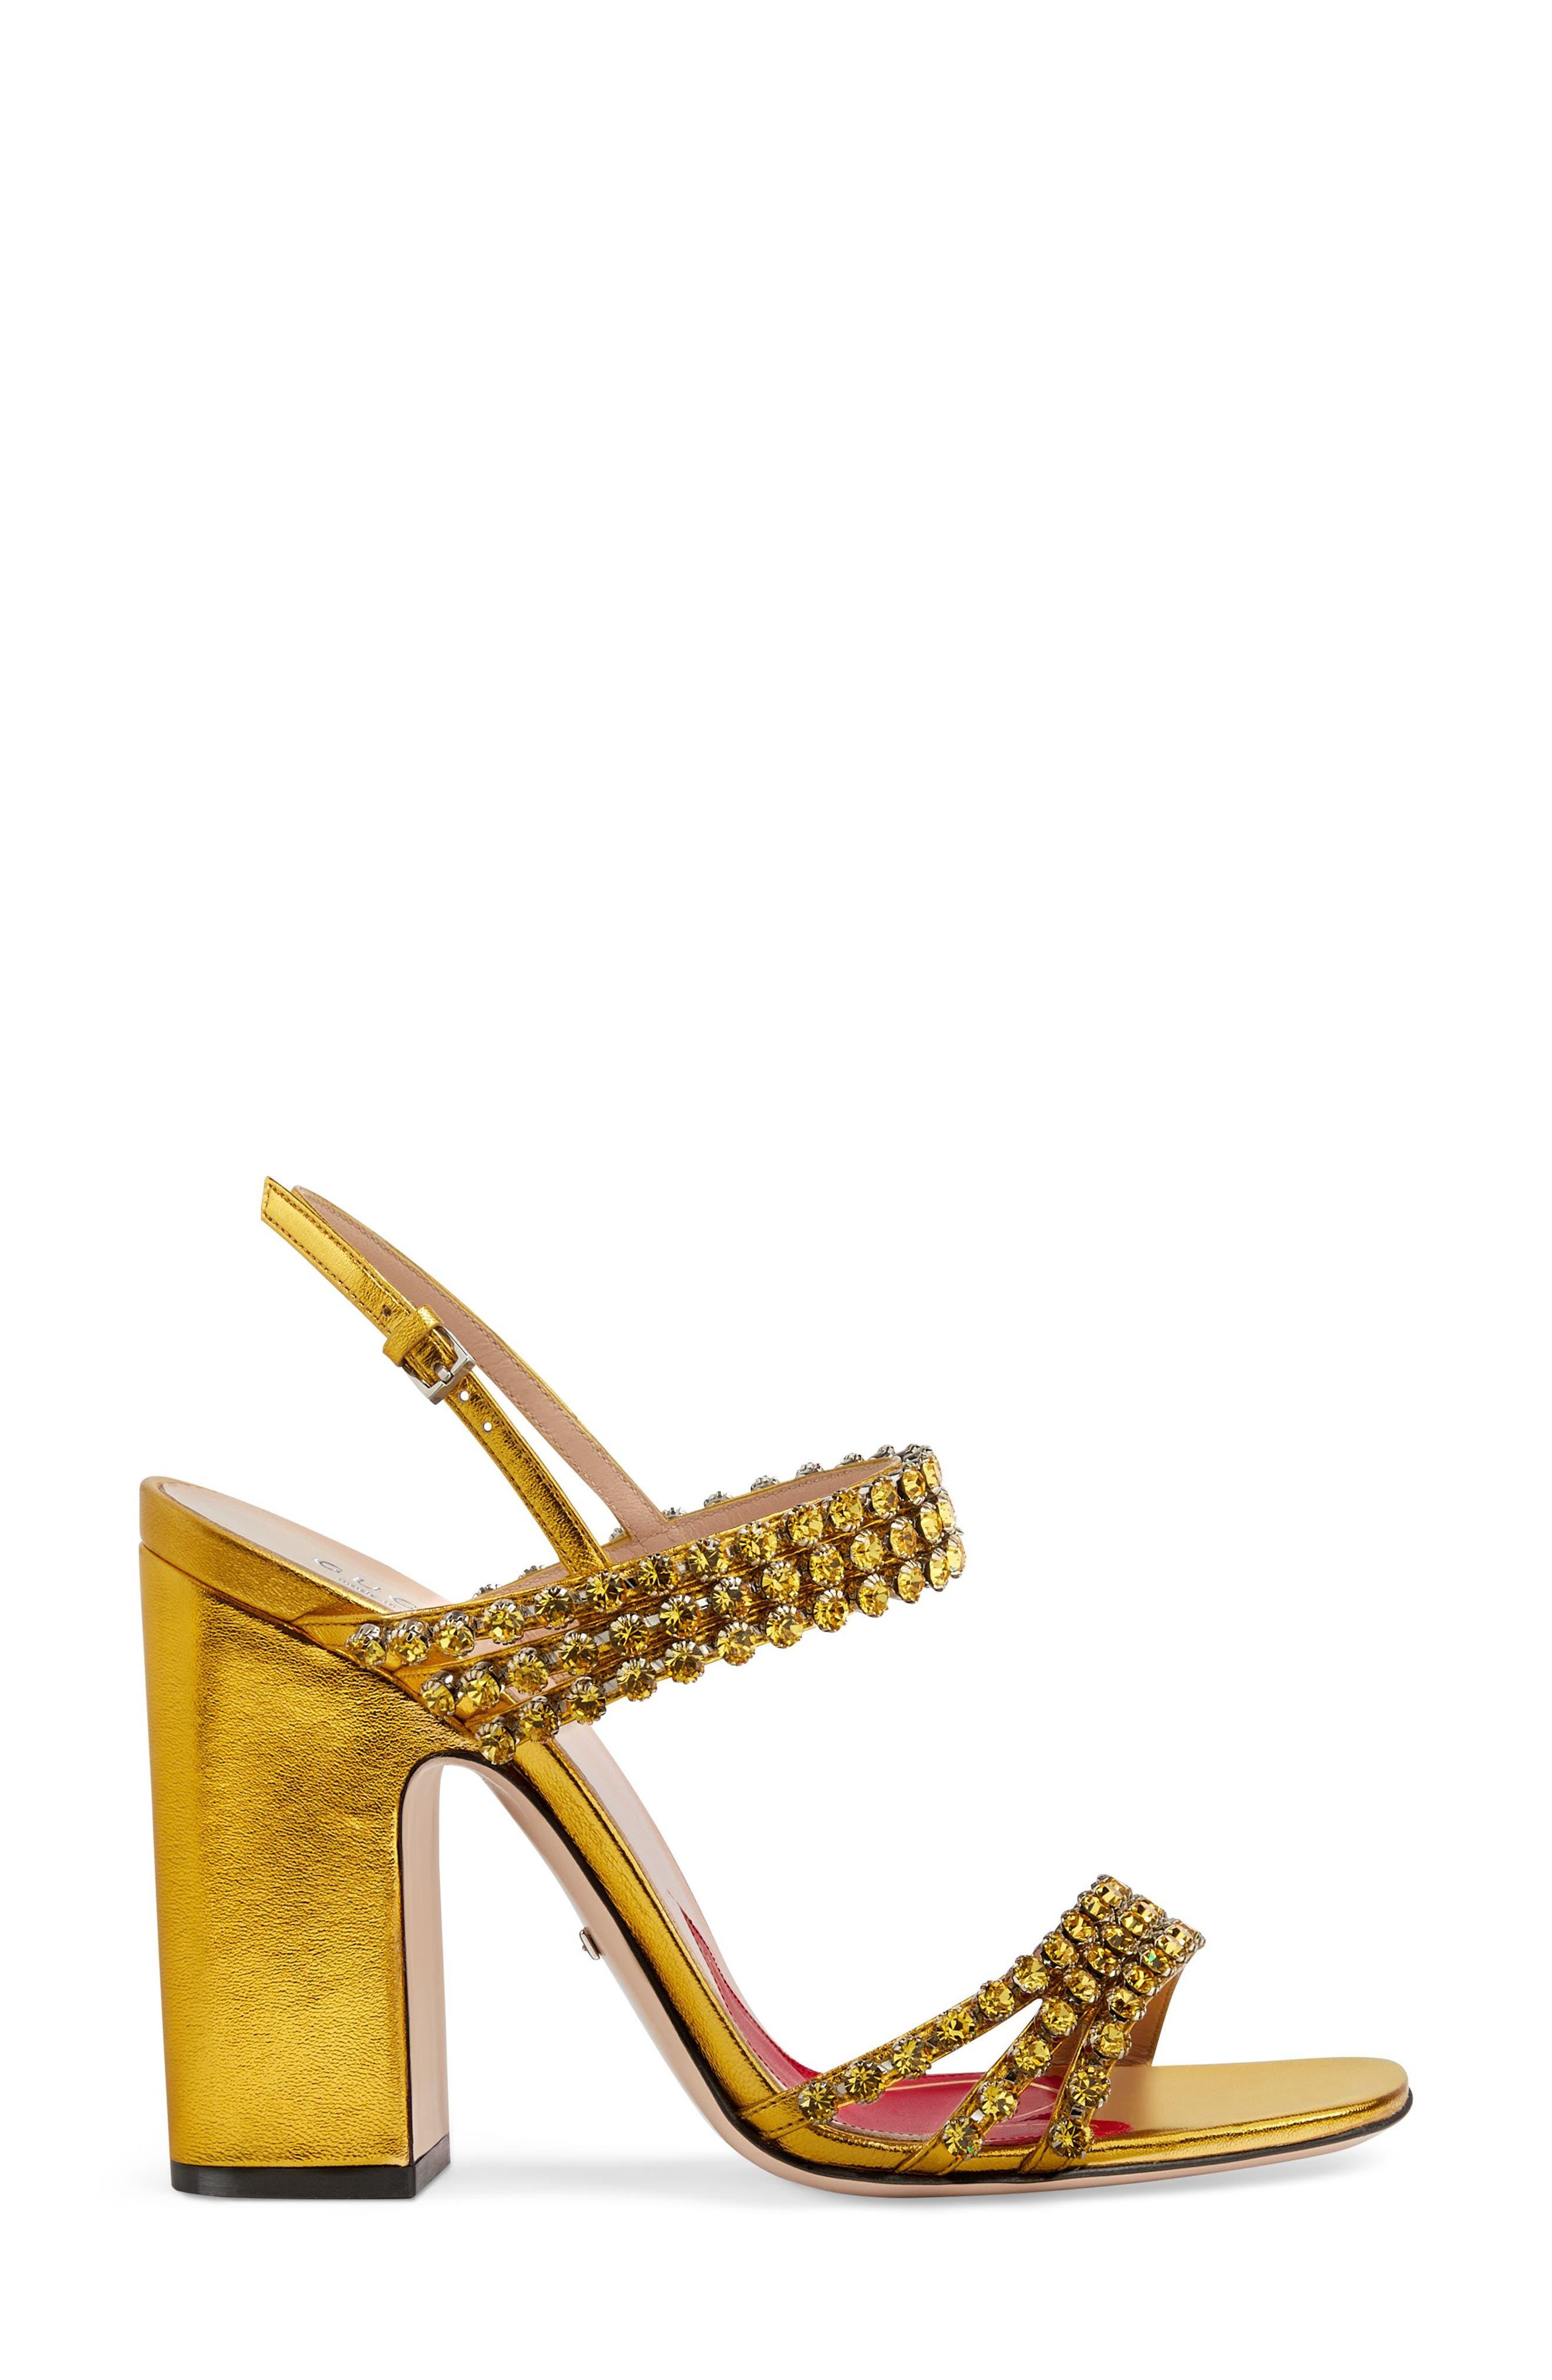 Bertie Jewel Sandal,                             Alternate thumbnail 2, color,                             GOLD LEATHER